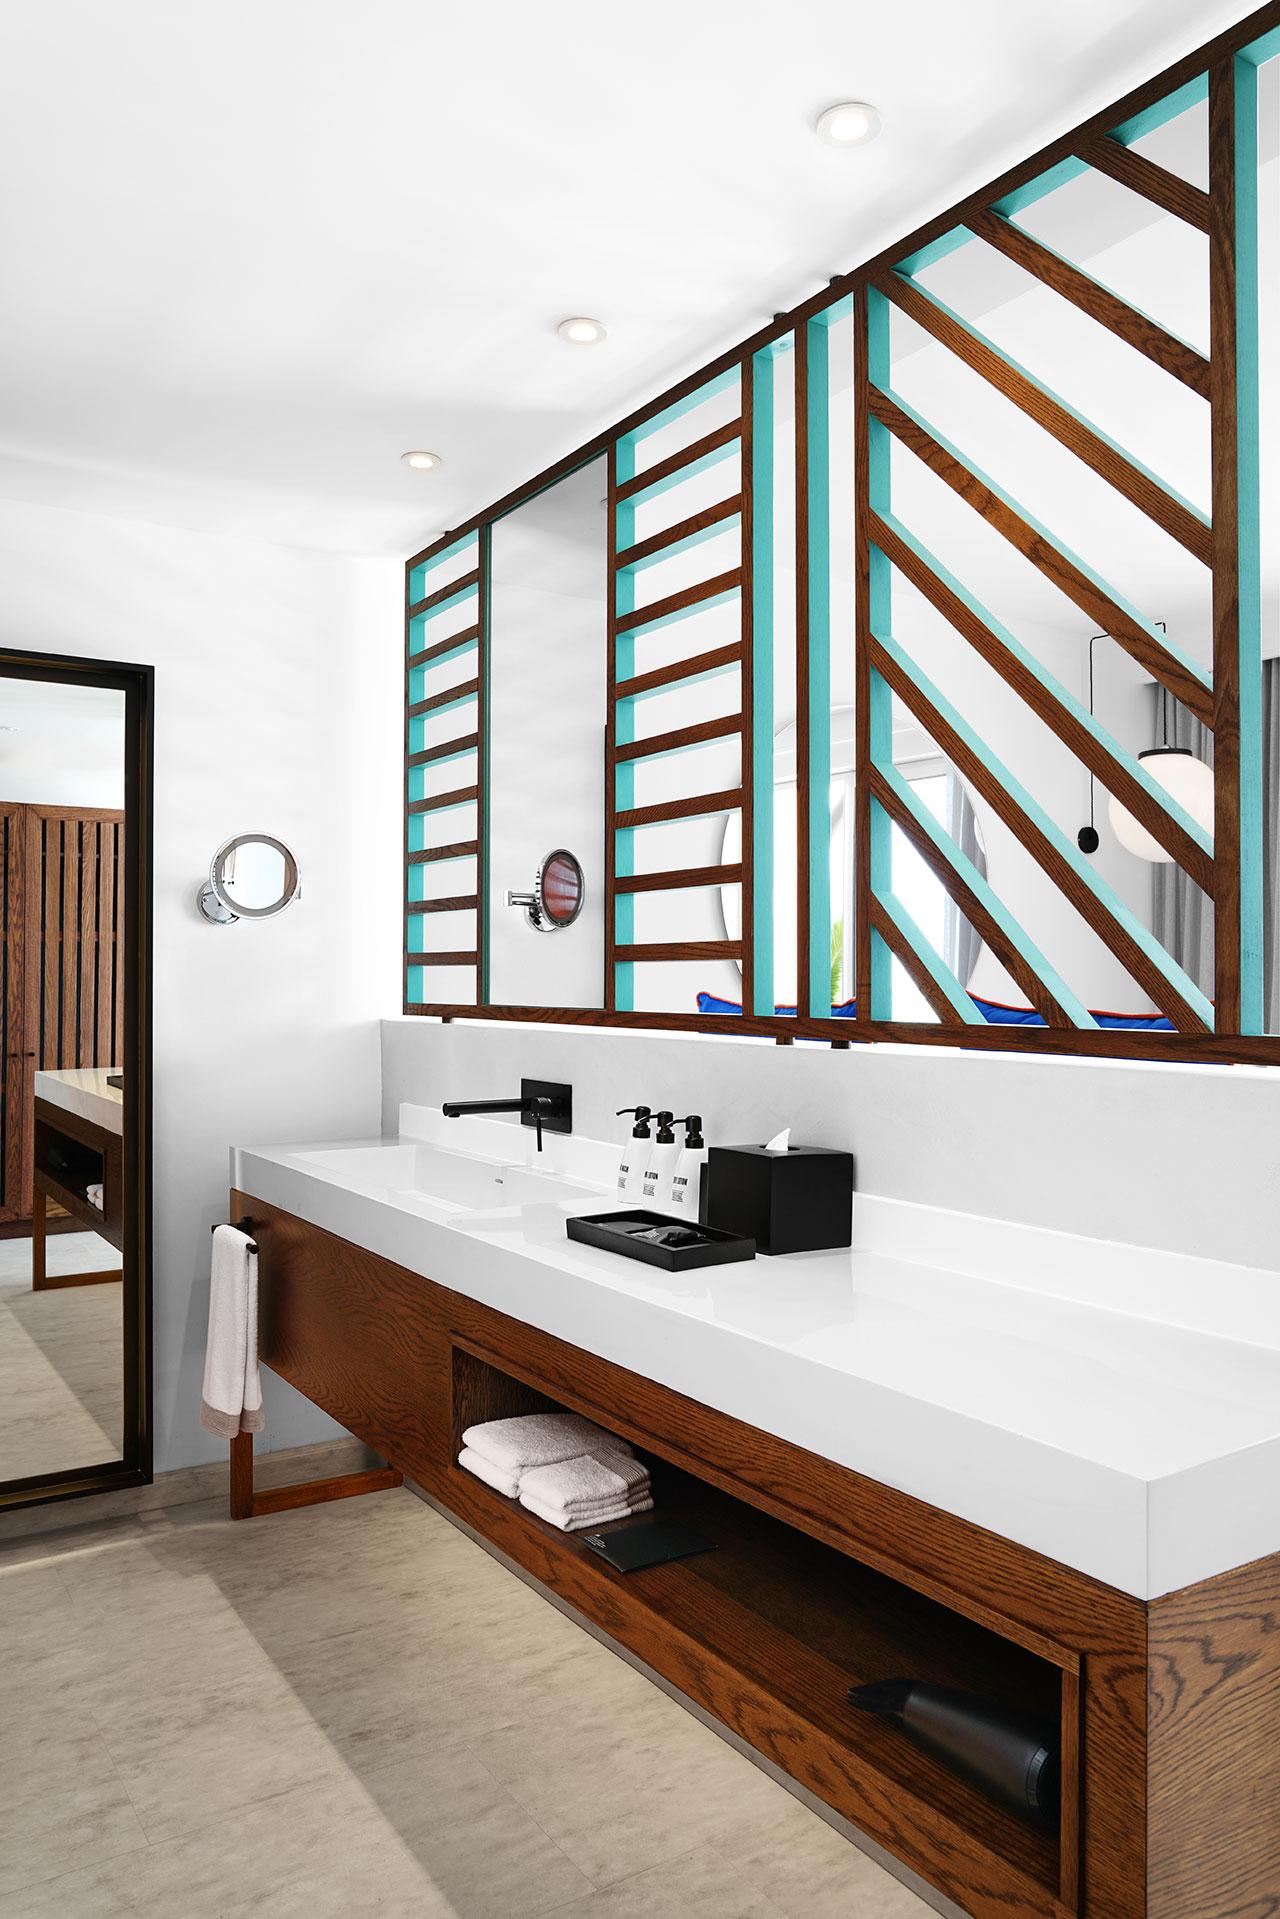 Room_221_bang_on_beach-5.jpg